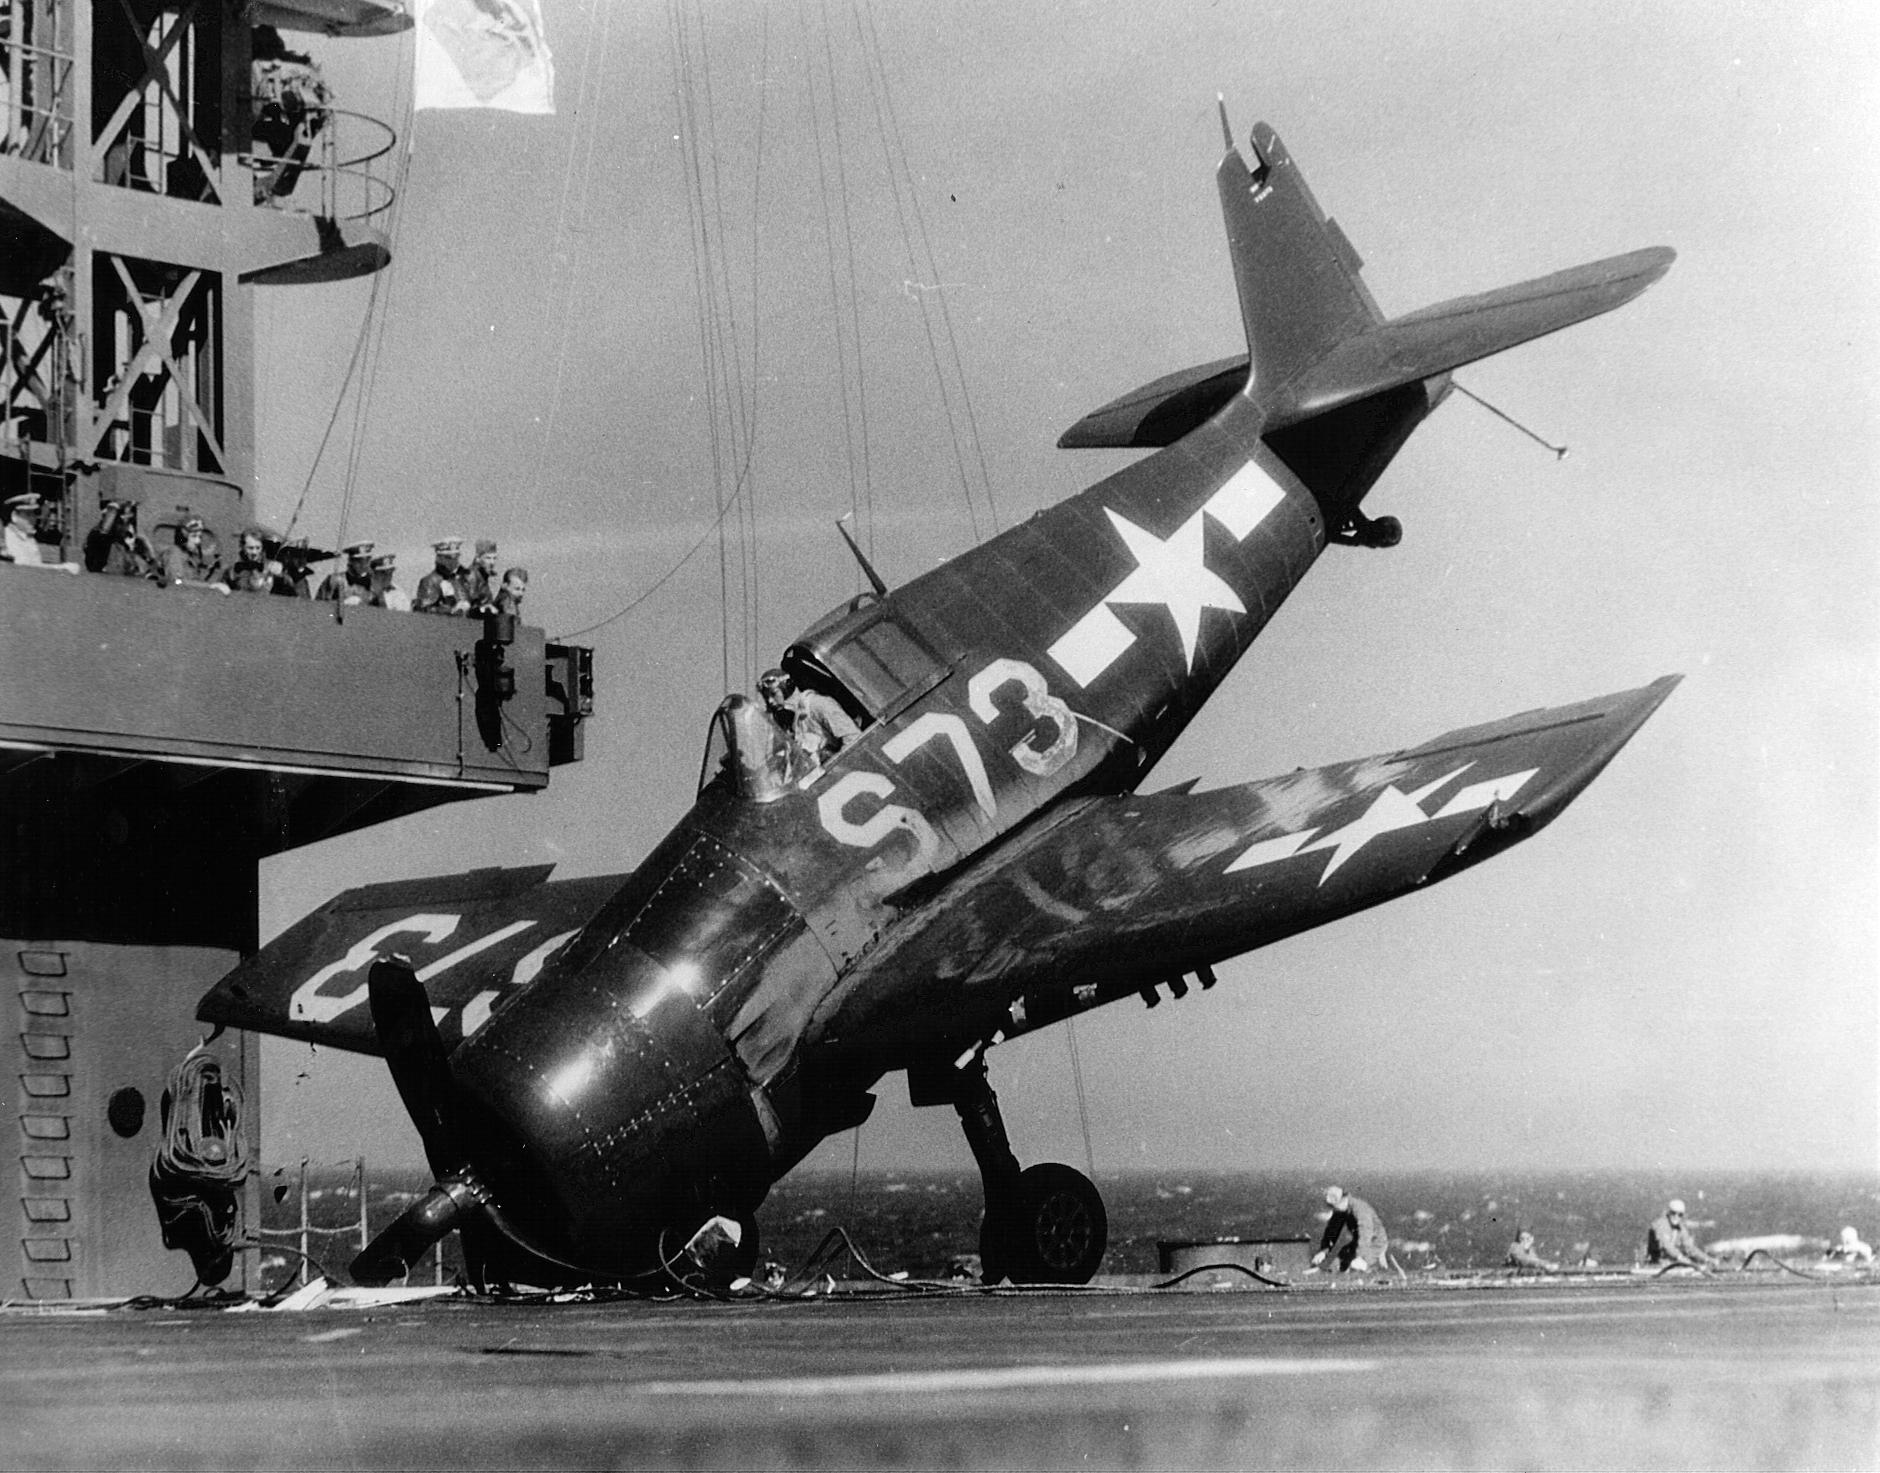 Grumman F6F 5 Hellcat VBF 11 White S73 landing mishap CVE 89 USS Takansis Bay 1945 01